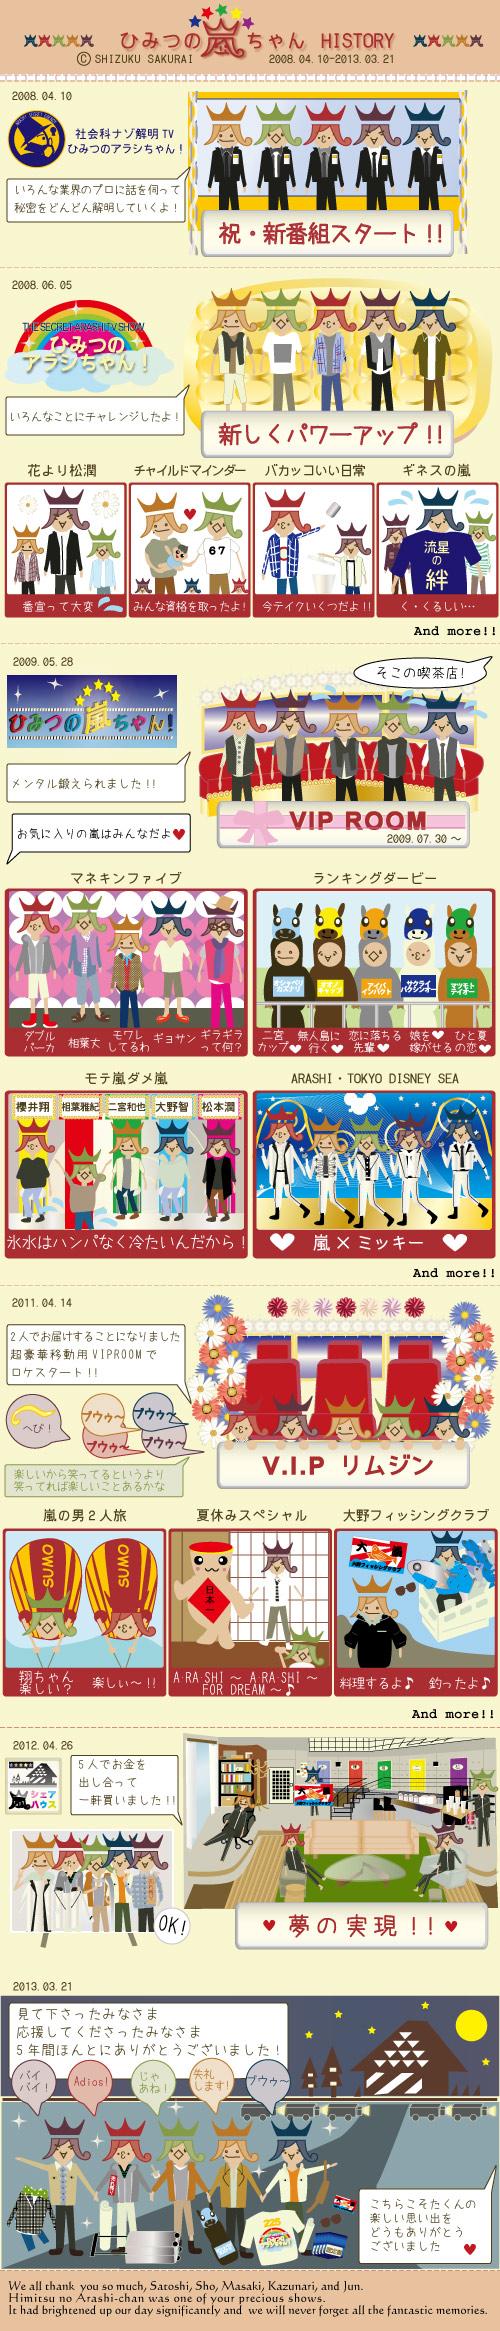 arashichan_history_130321.jpg